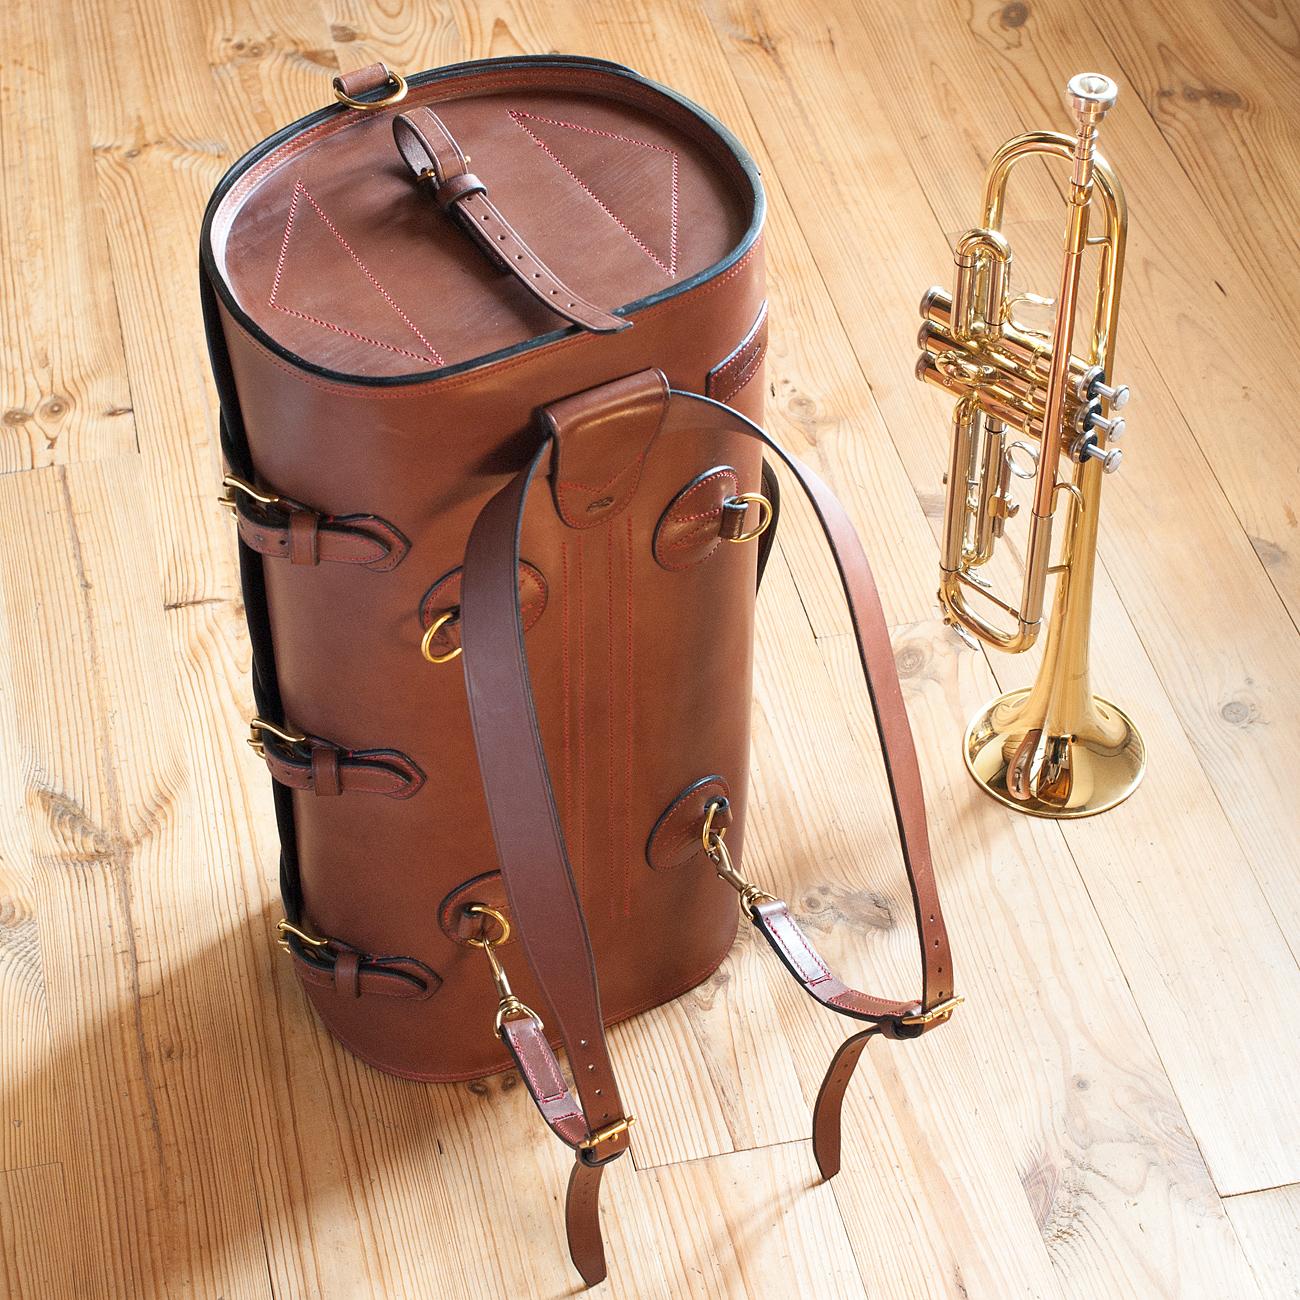 sacoche_trompette01_img06_HD